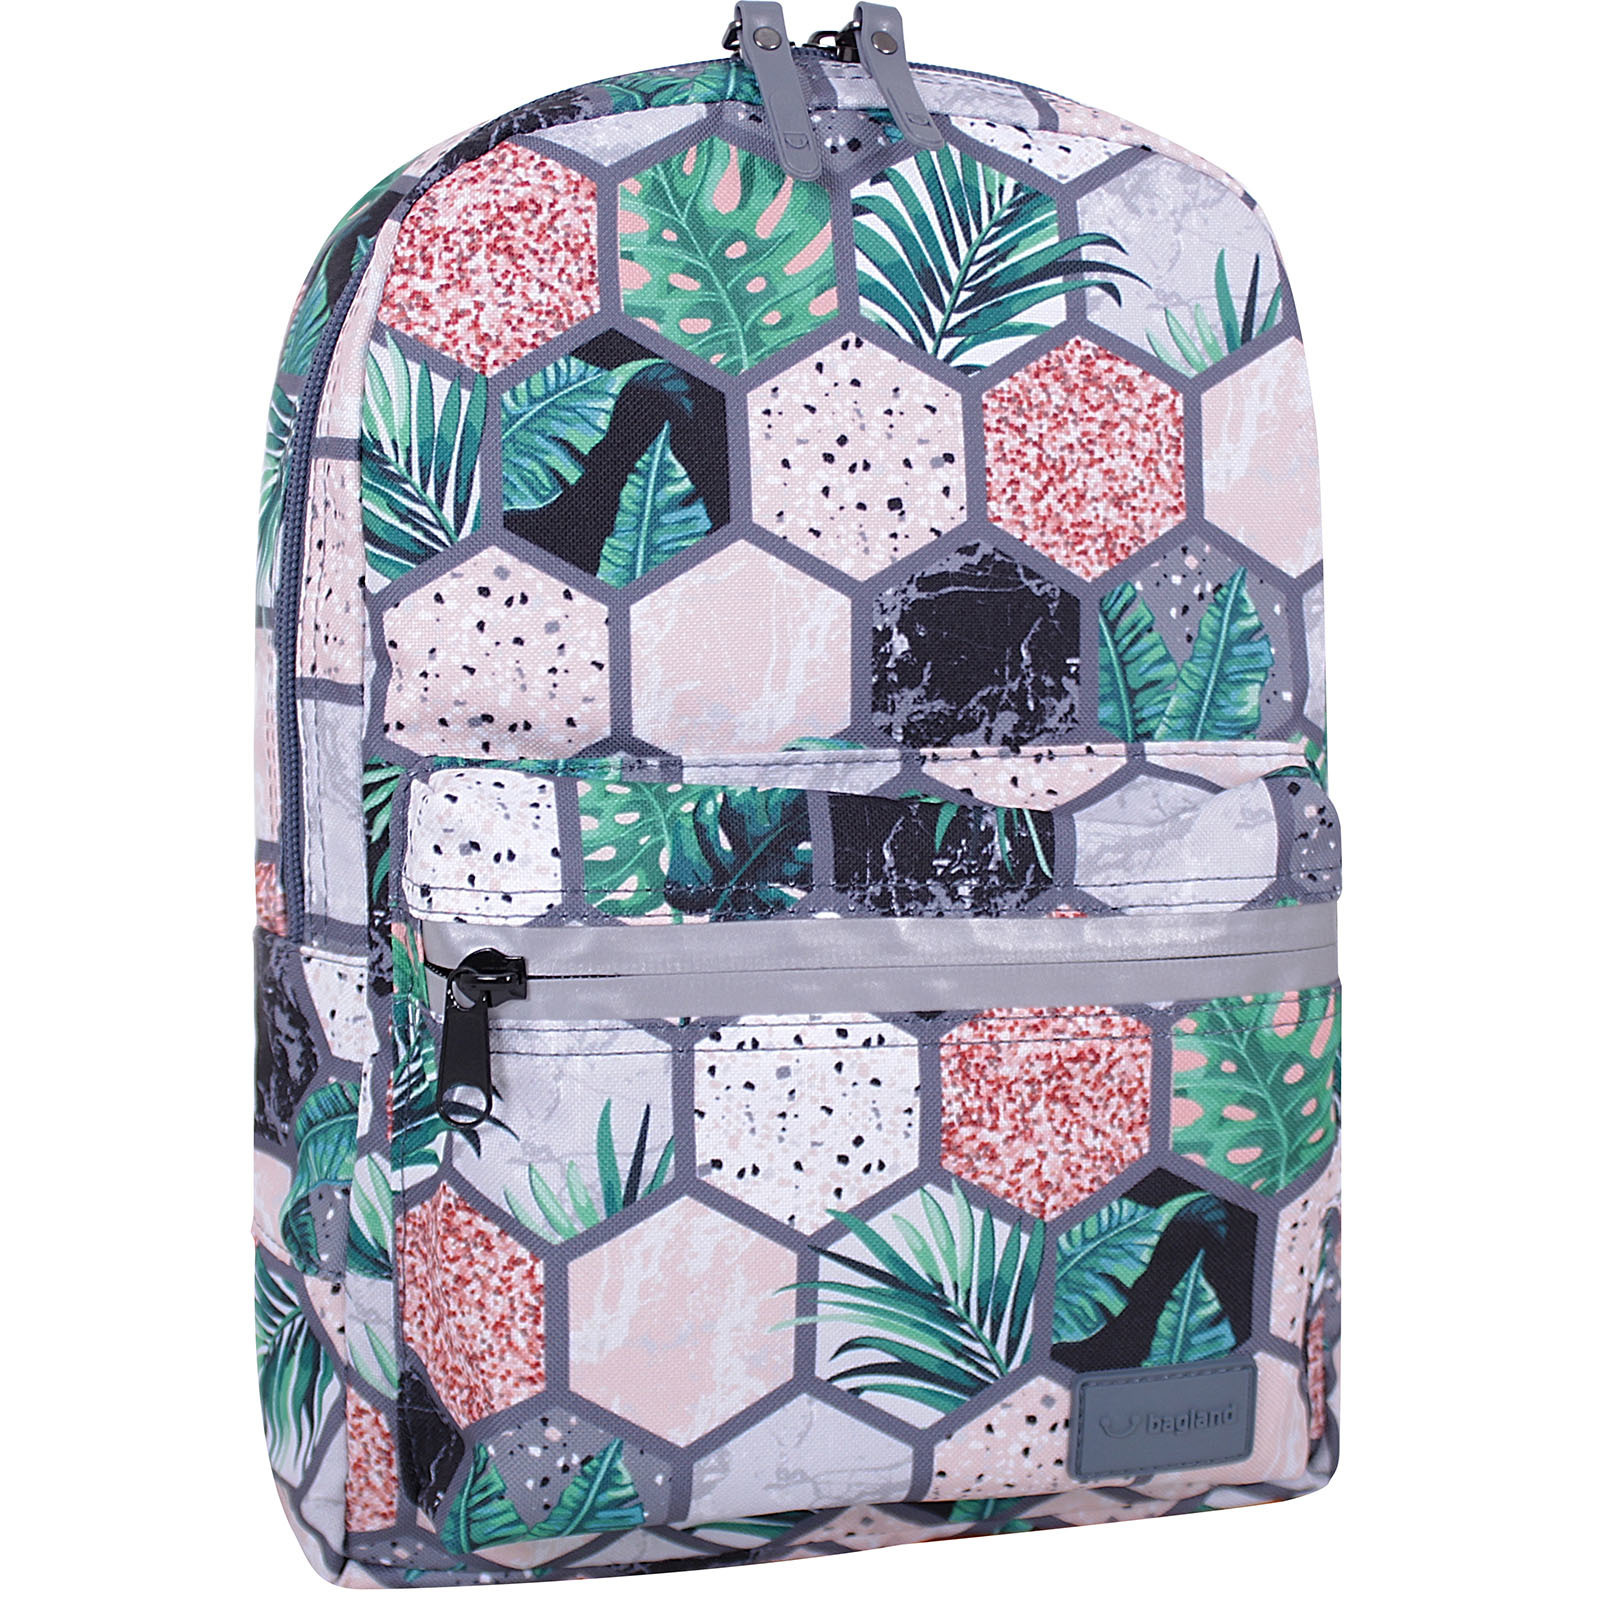 Молодежные рюкзаки Рюкзак Bagland Молодежный mini 8 л. сублимация 757 (00508664) IMG_1934суб.757.JPG